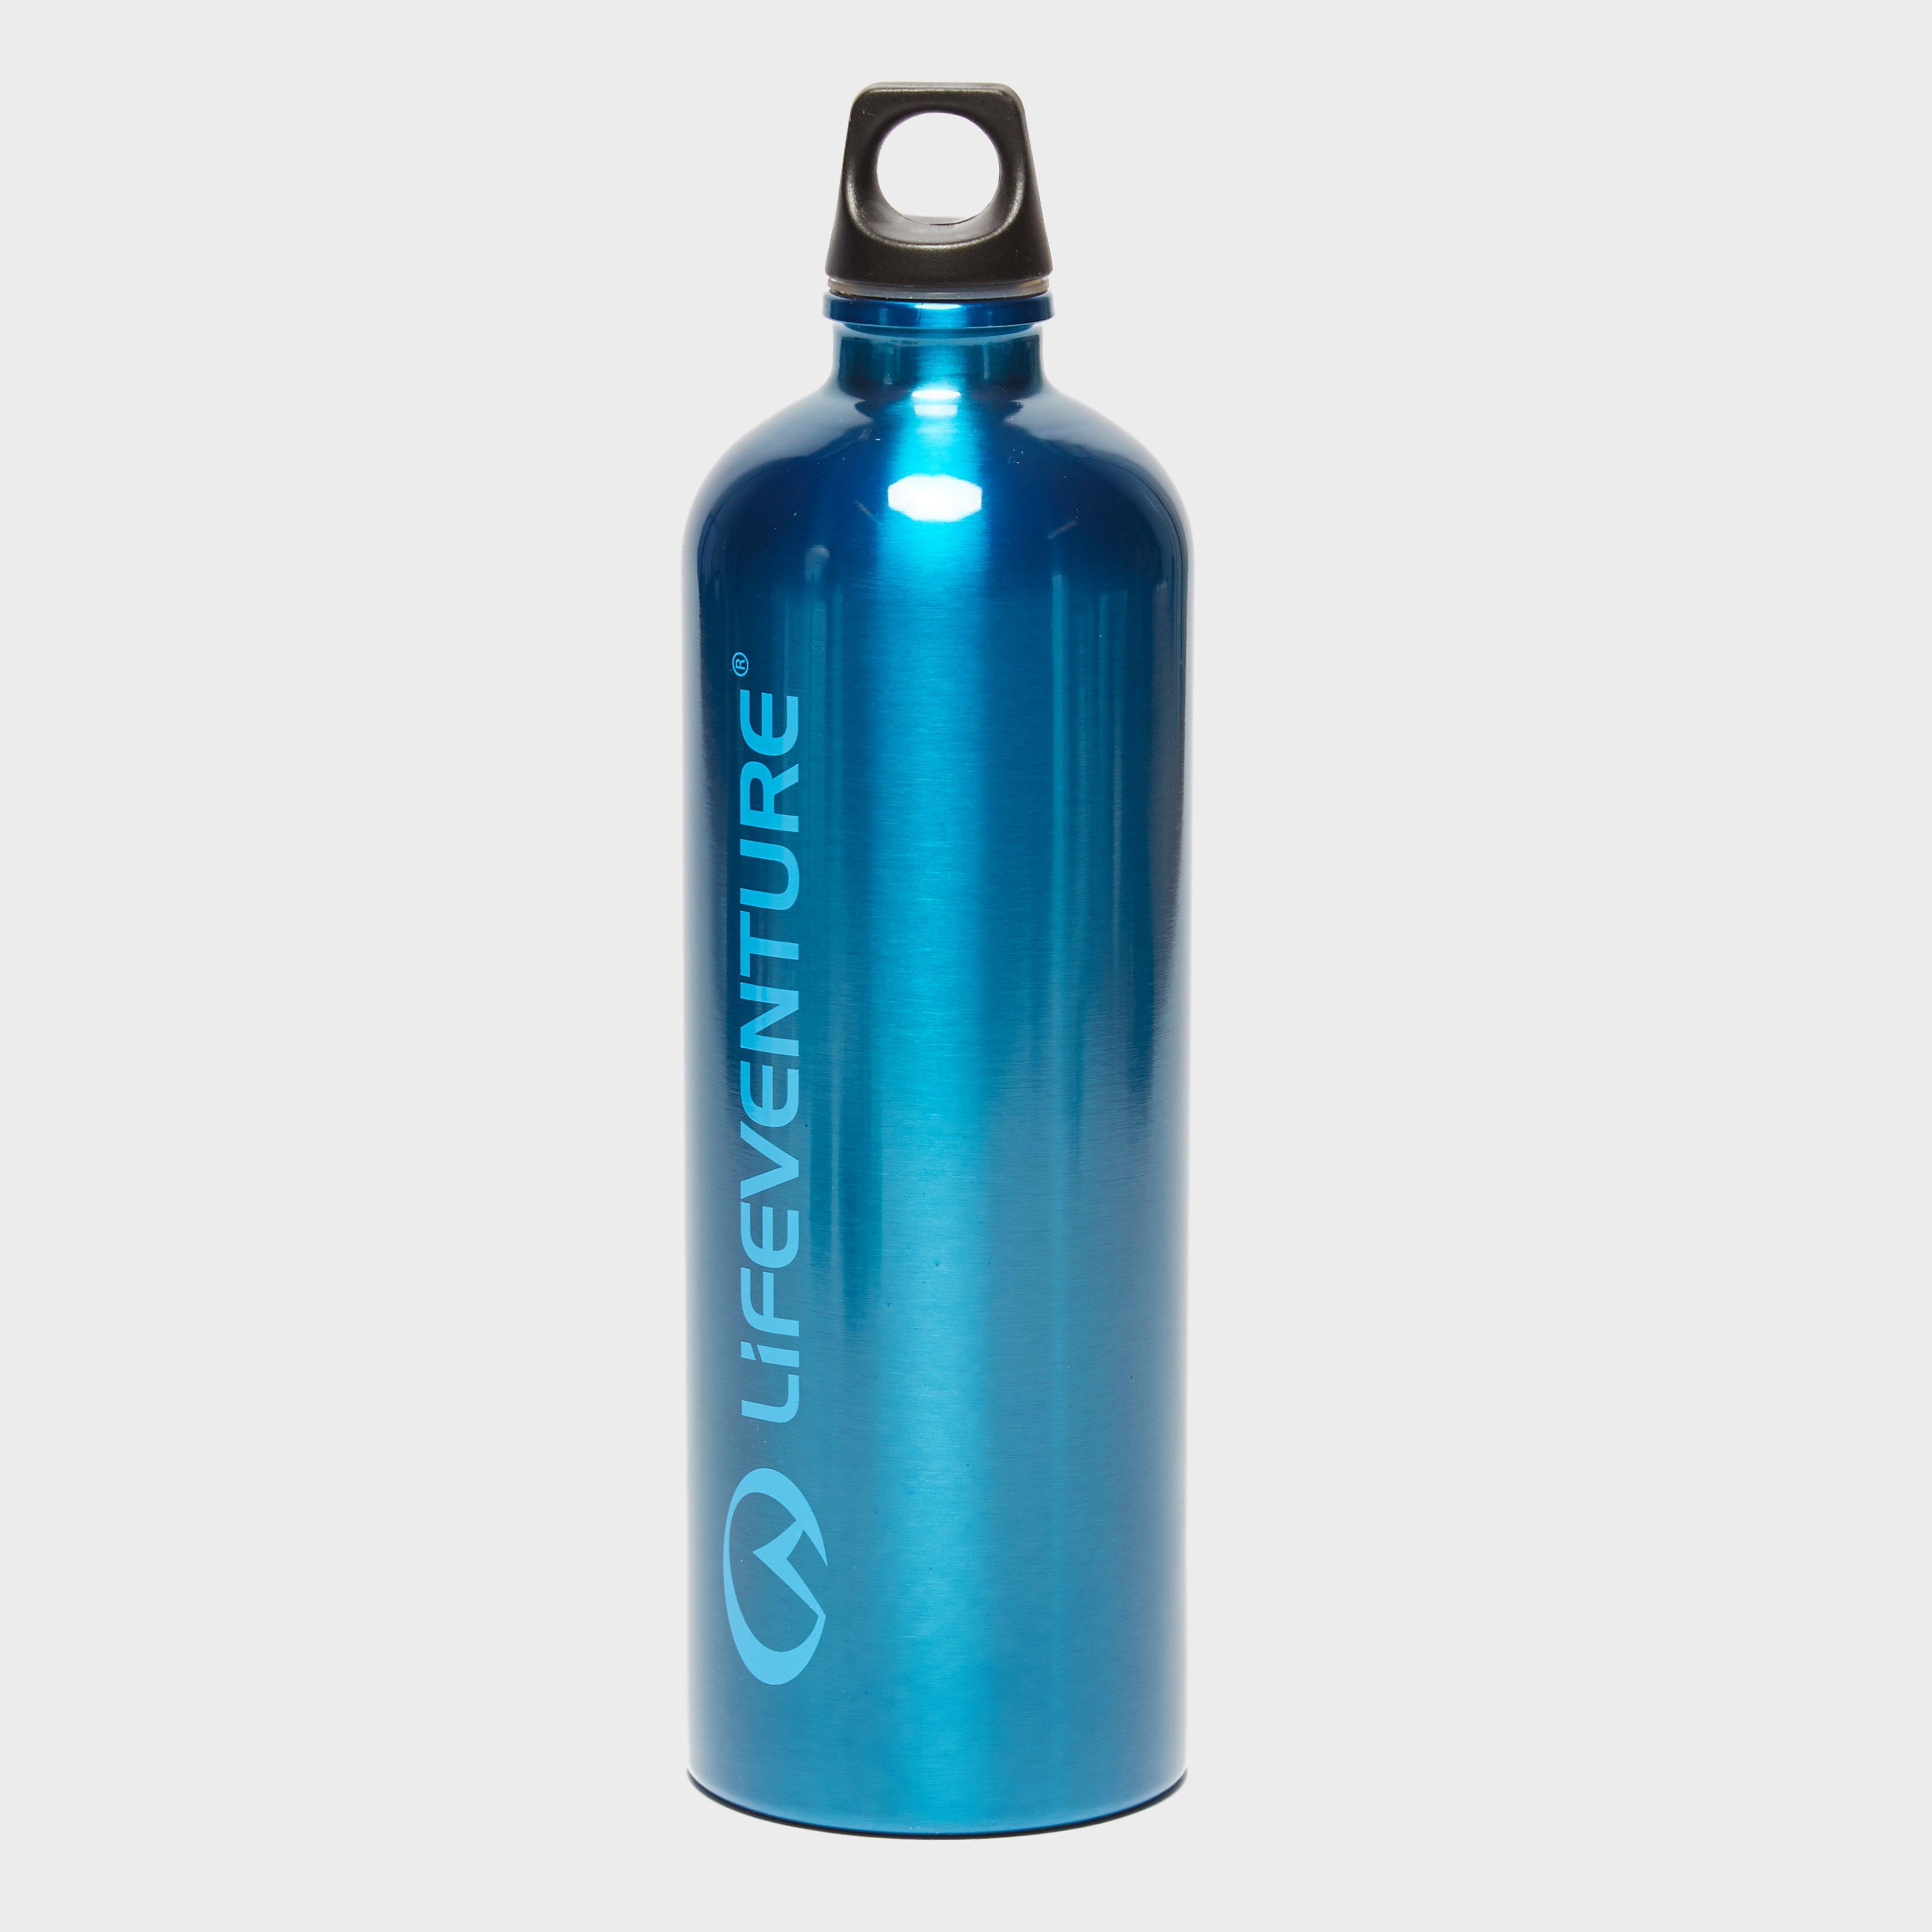 Lifeventure Lifeventure Stainless Steel 1L Bottle - Blue, Blue